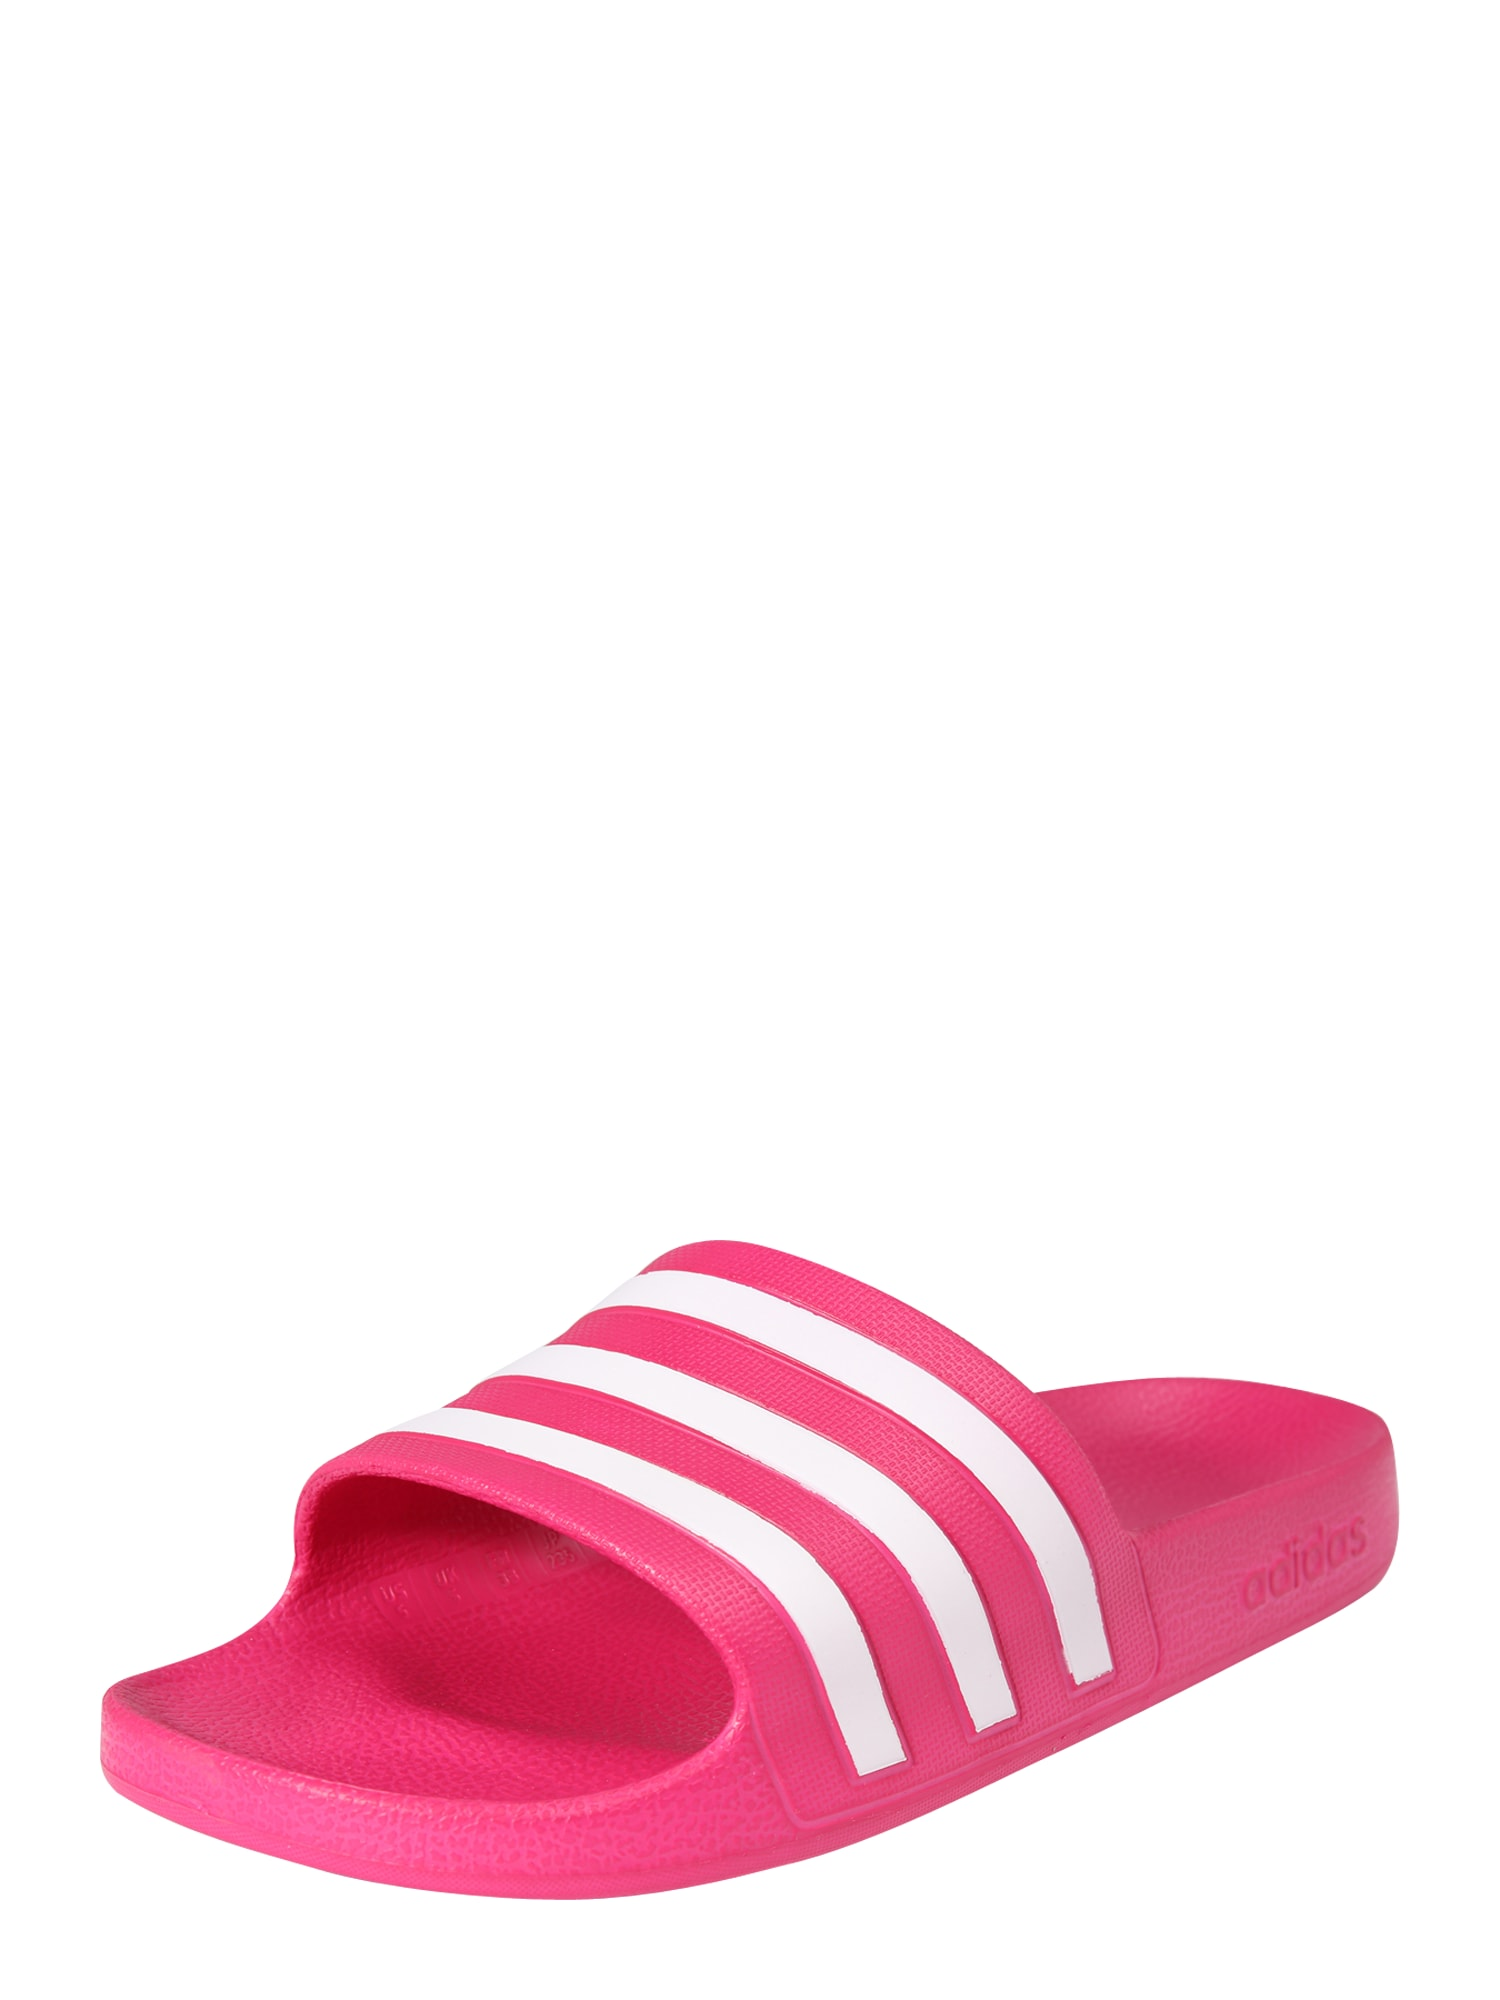 Plážovákoupací obuv Adilette Aqua pink bílá ADIDAS PERFORMANCE